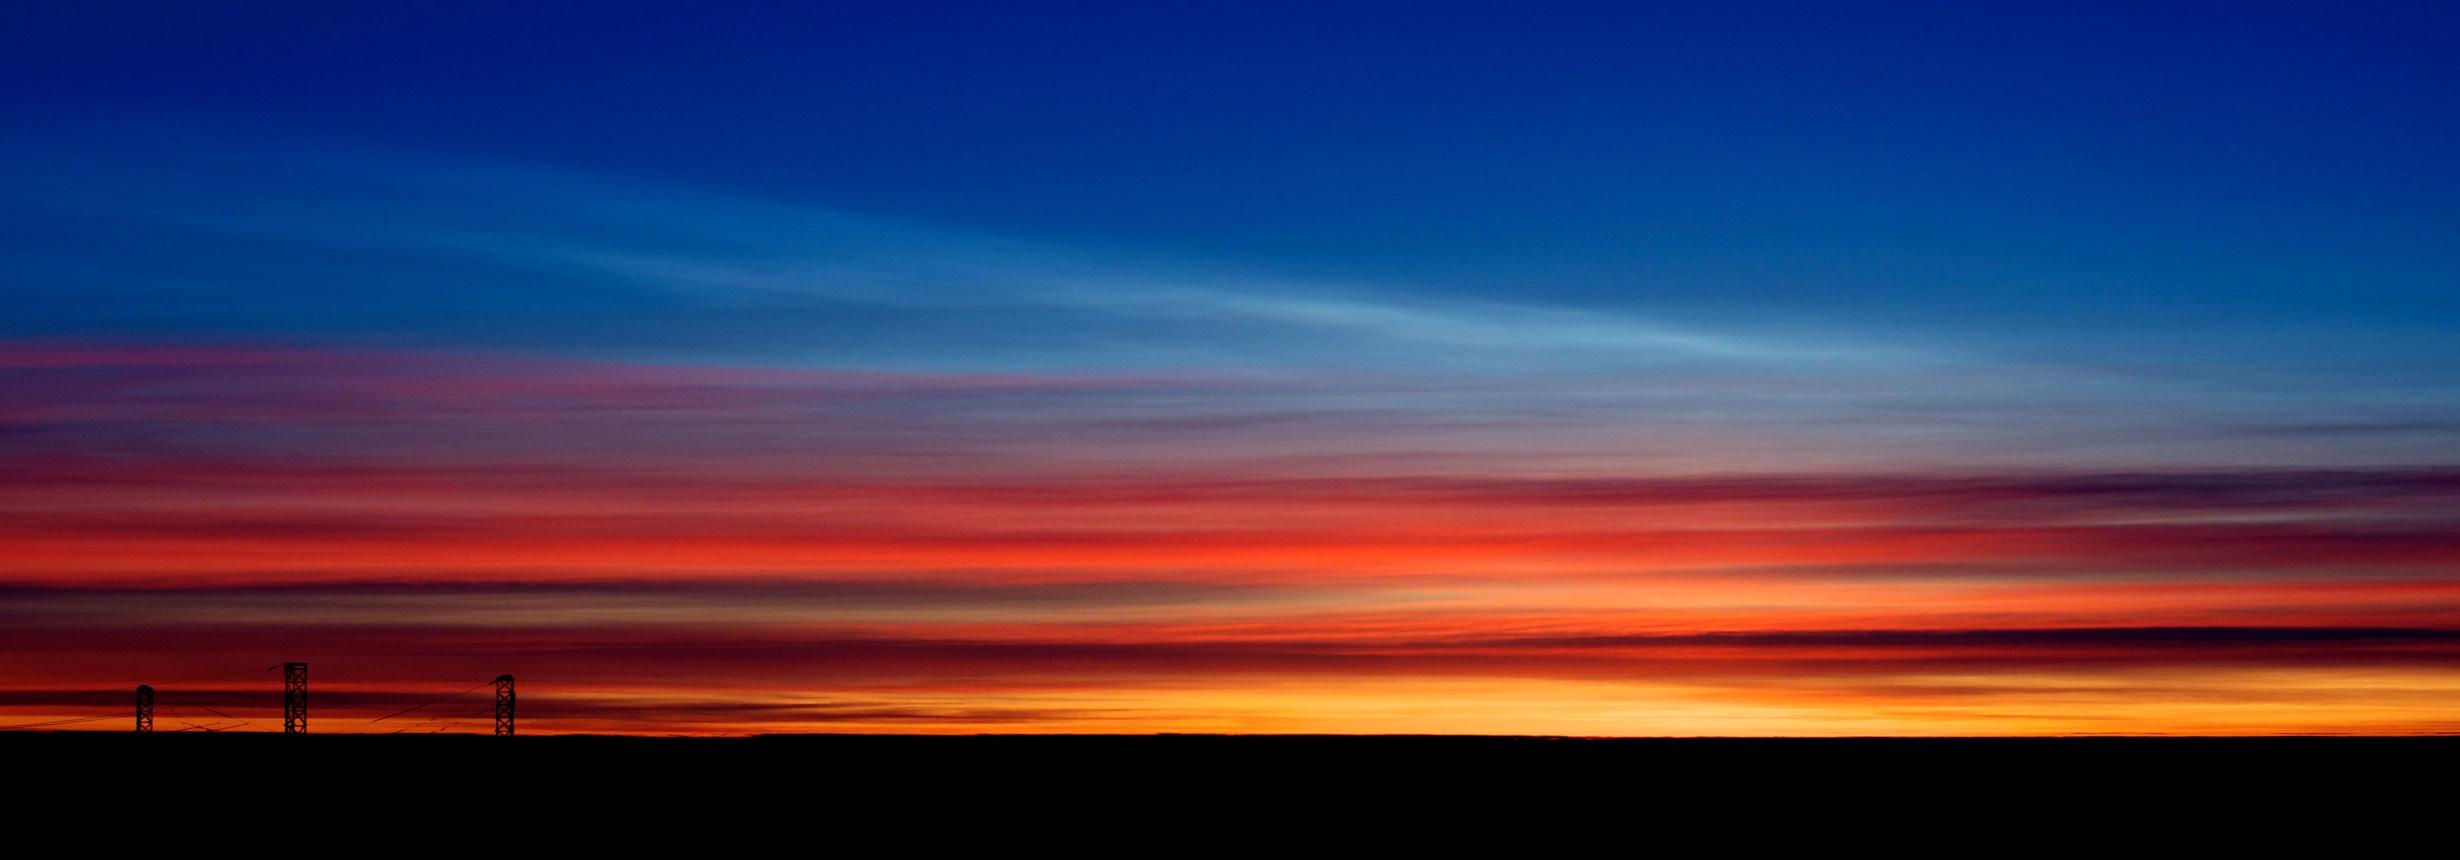 Polar stratospheric clouds. Photo courtesy of Wikipedia.